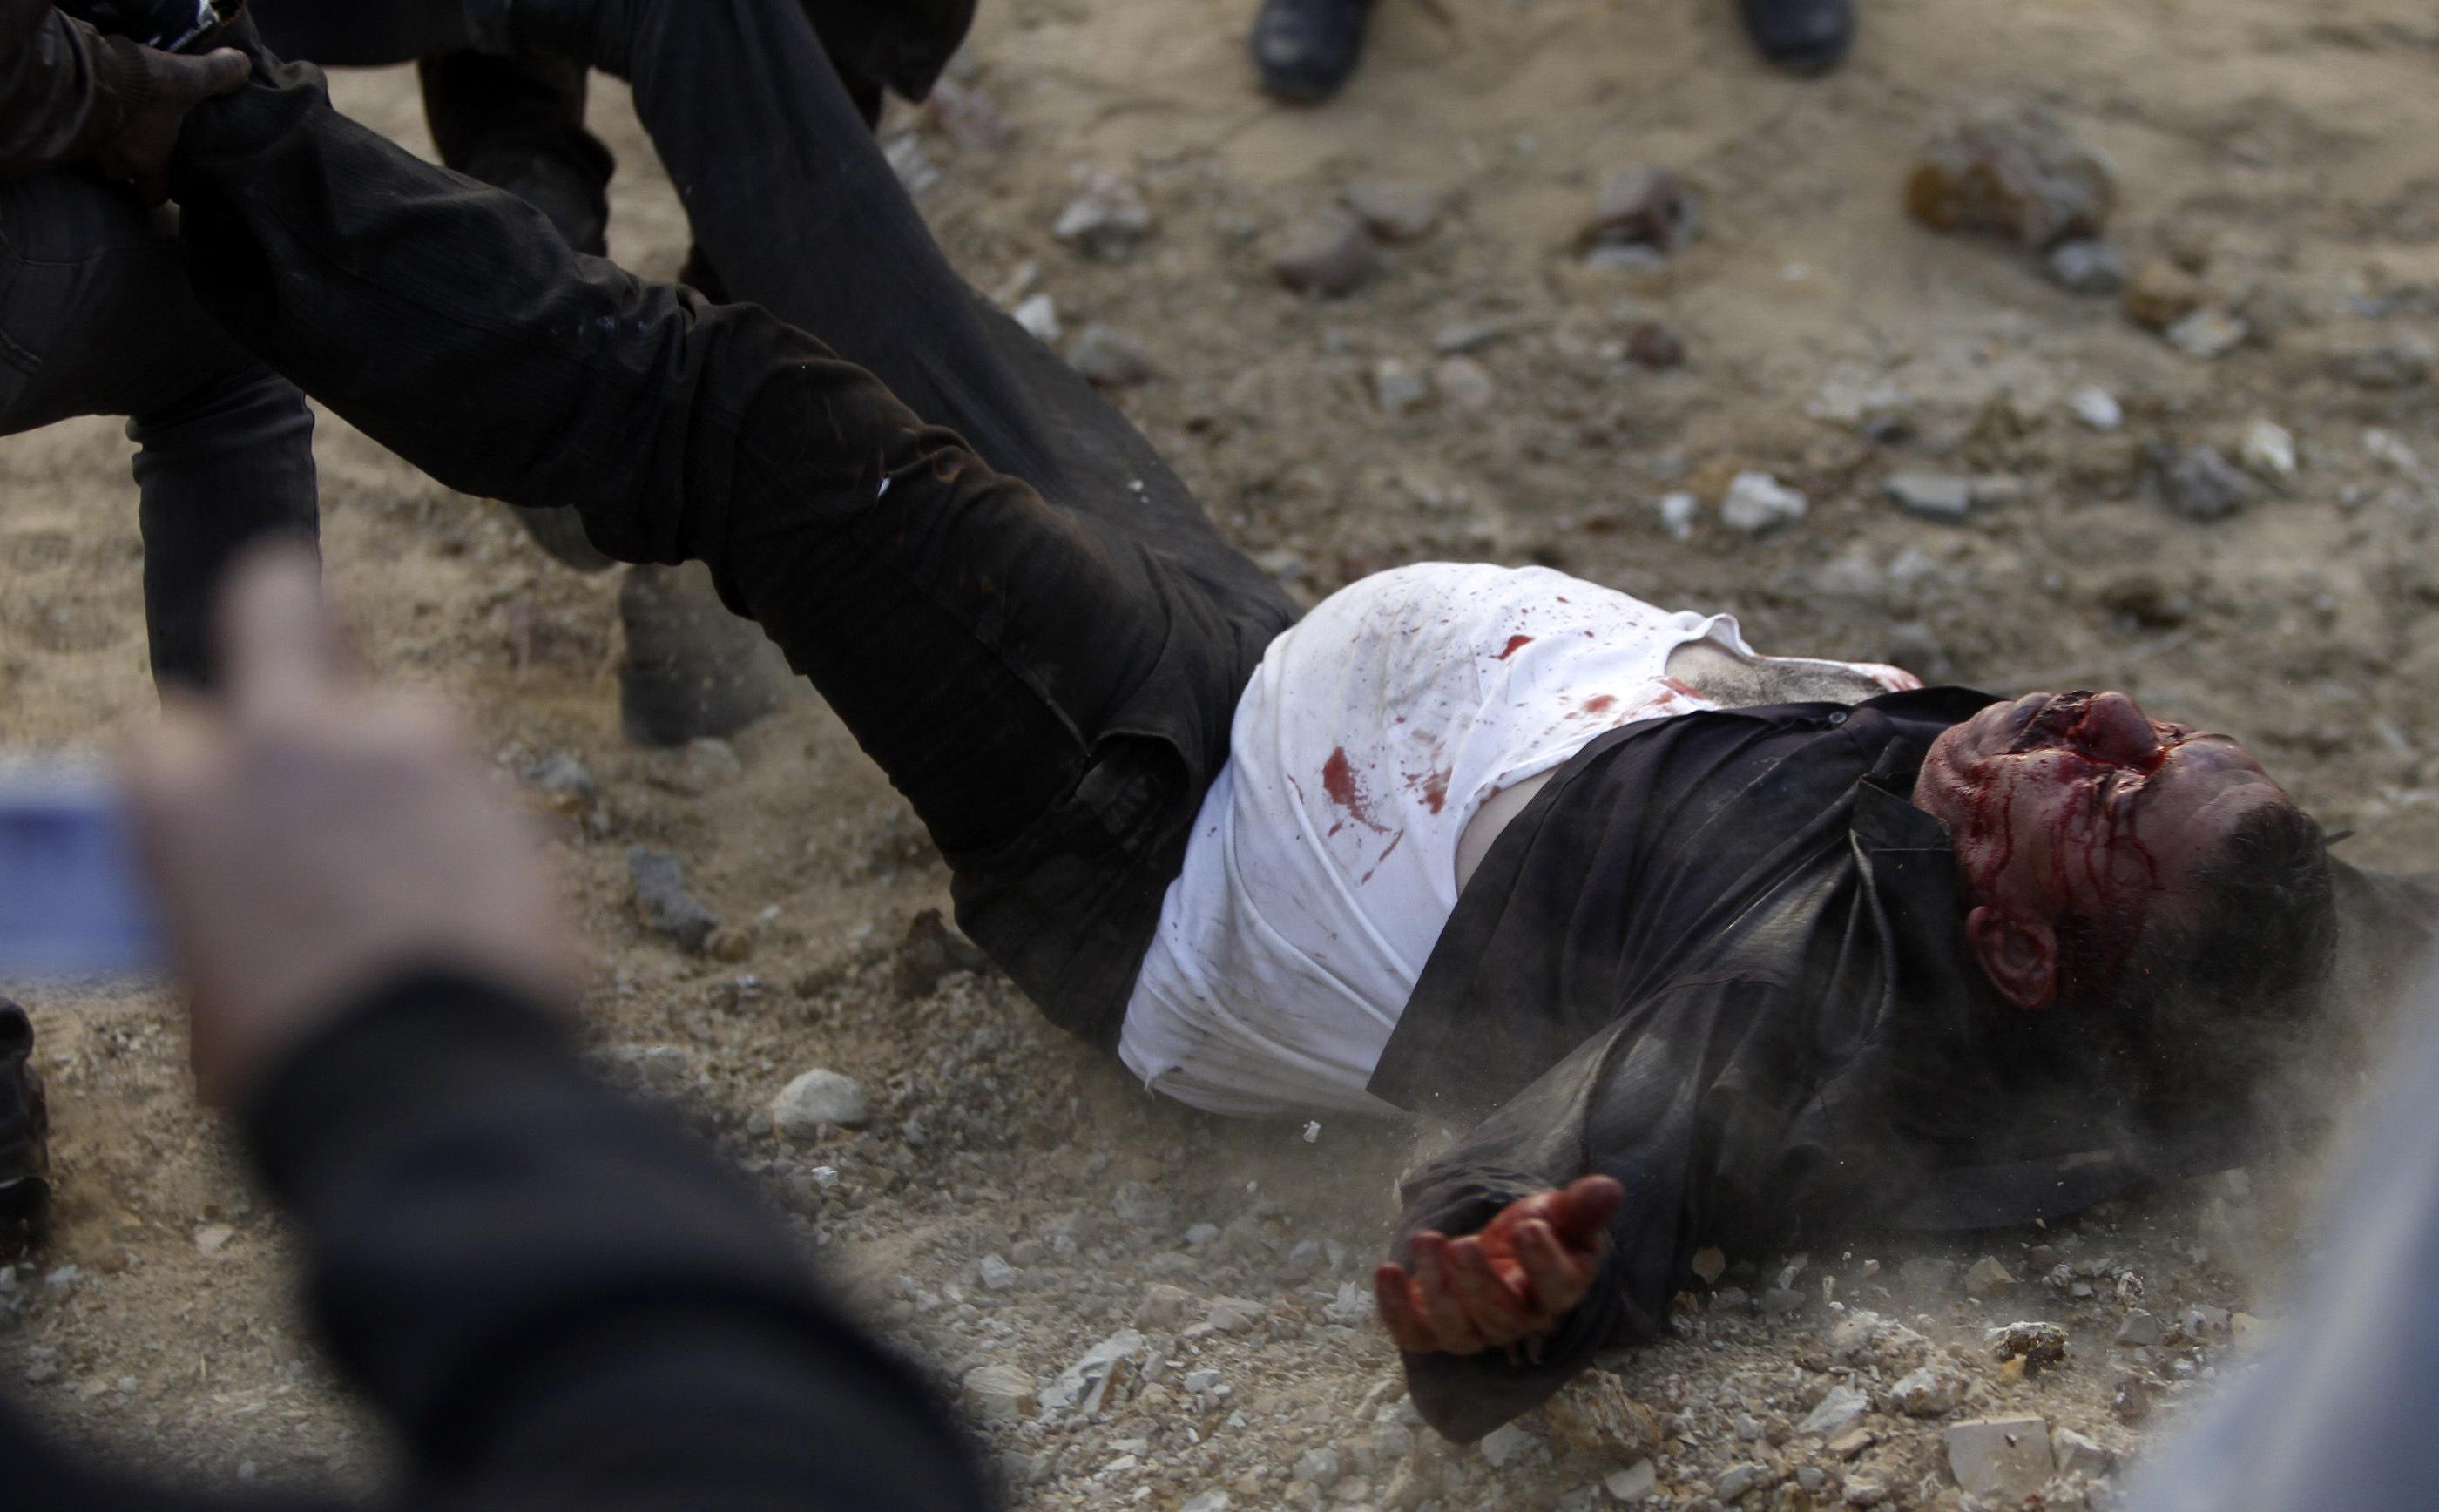 Egypt's April 6 movement condemns anti-Brotherhood violence